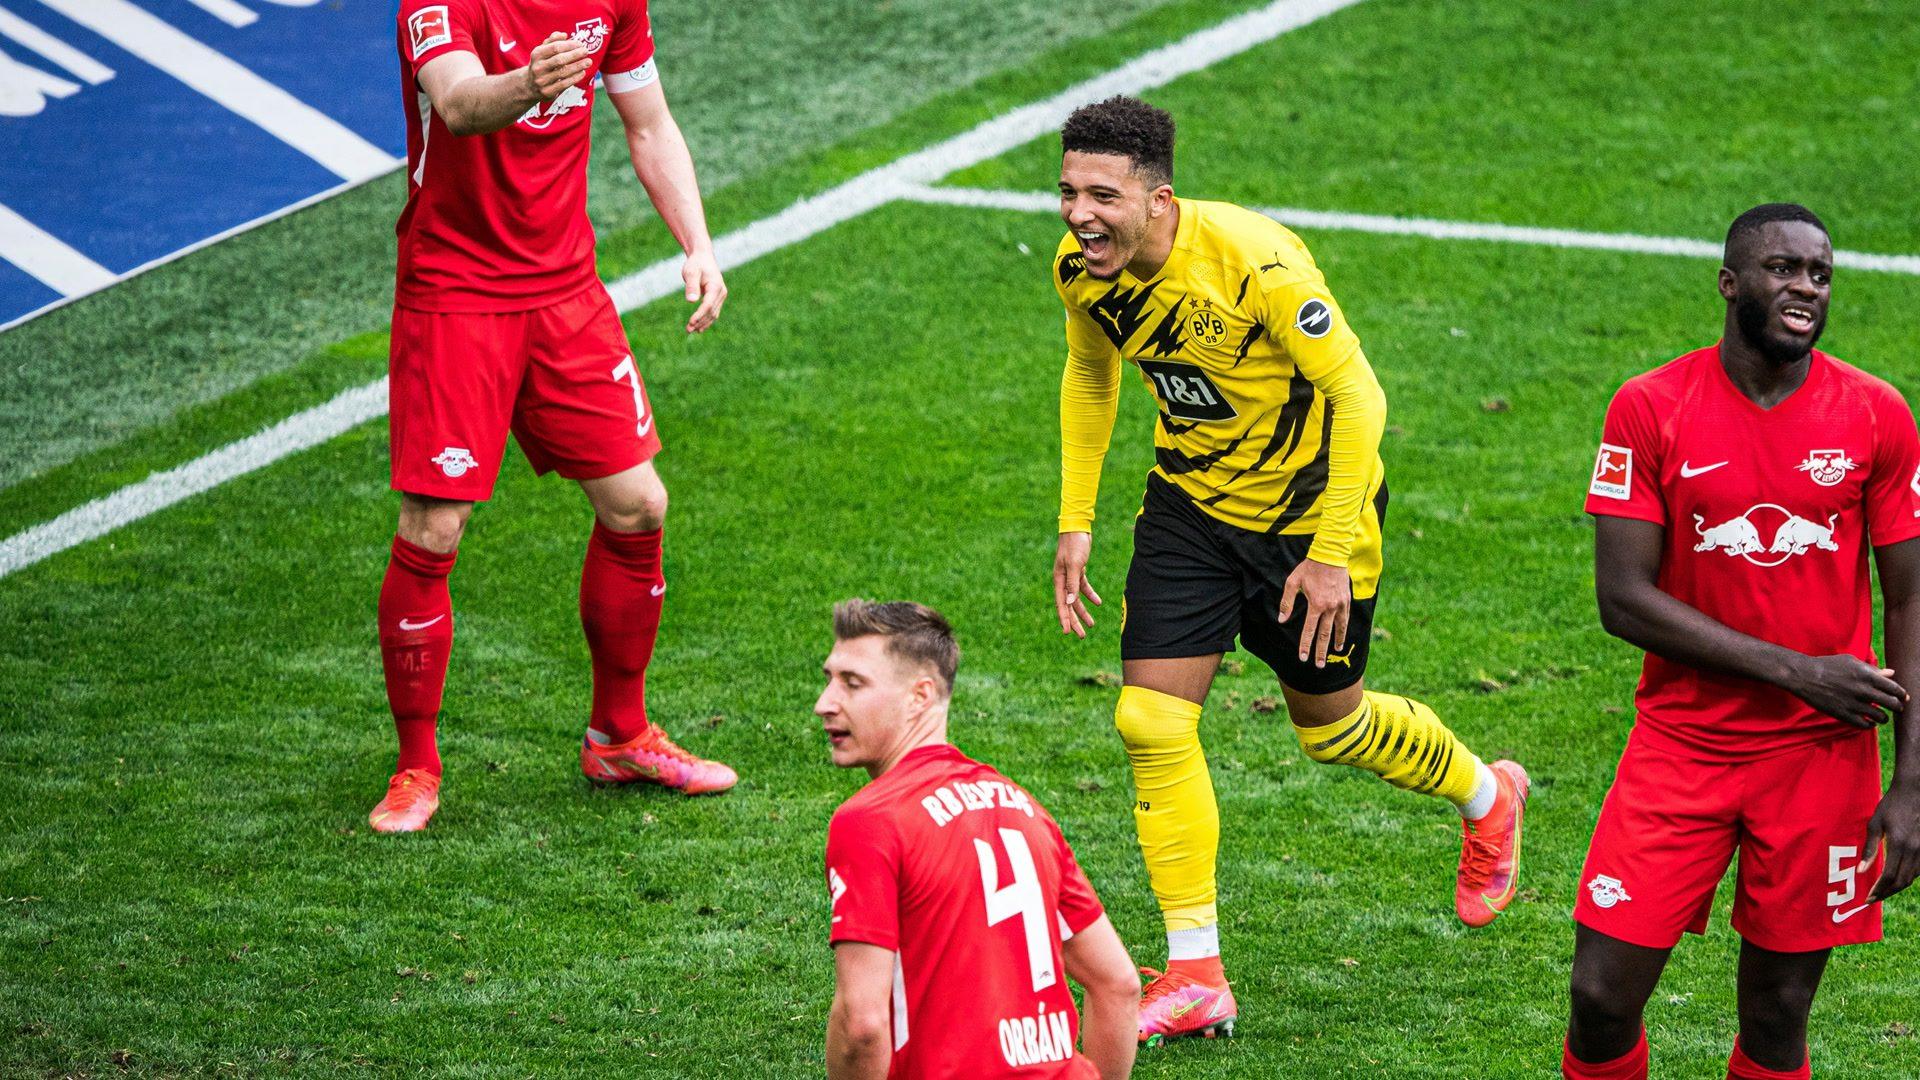 Jadon Sancho fires Dortmund into top four and ends Leipzig's title challenge